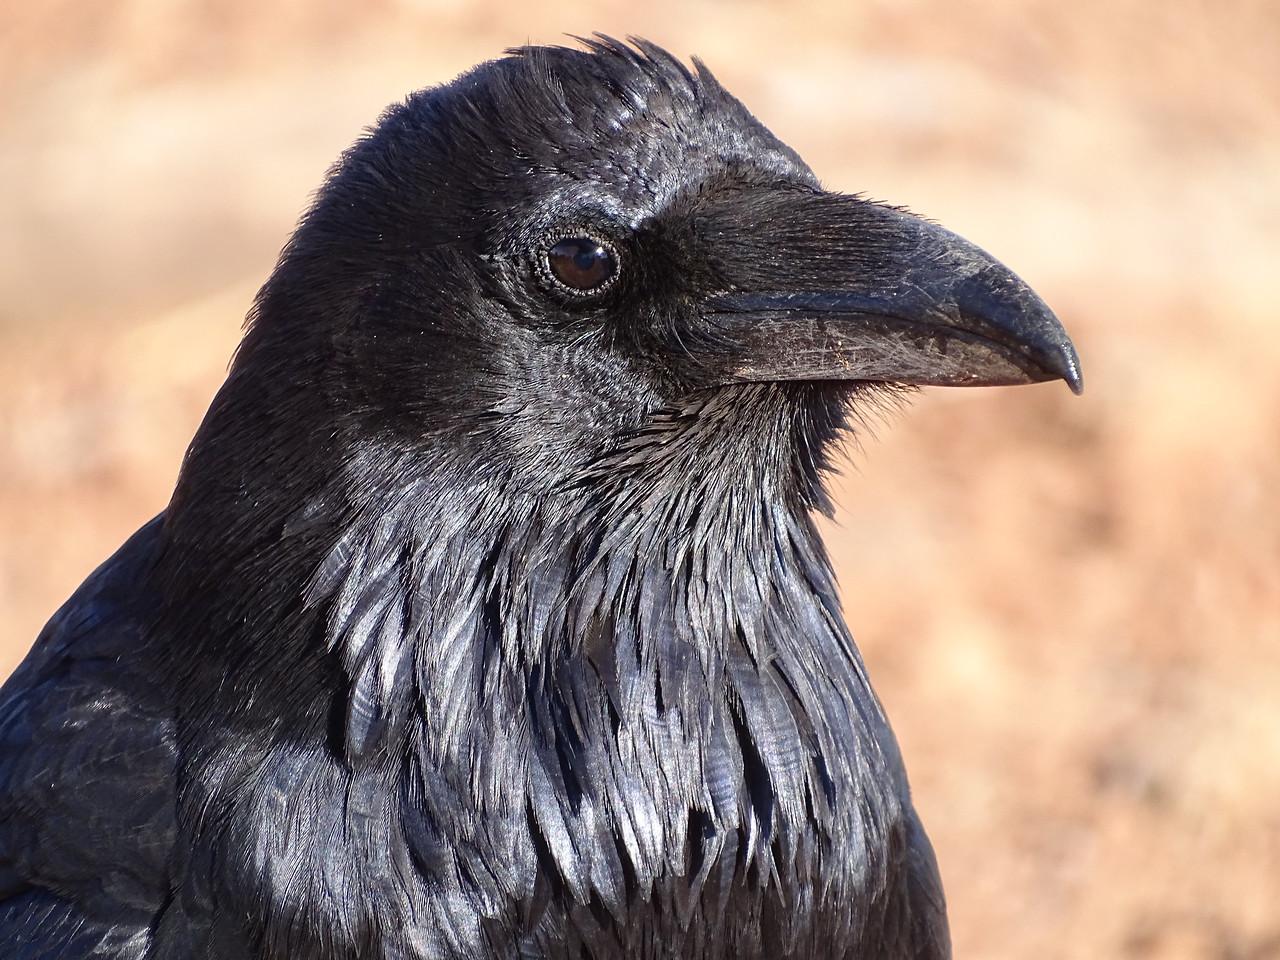 Raven's glossy bib